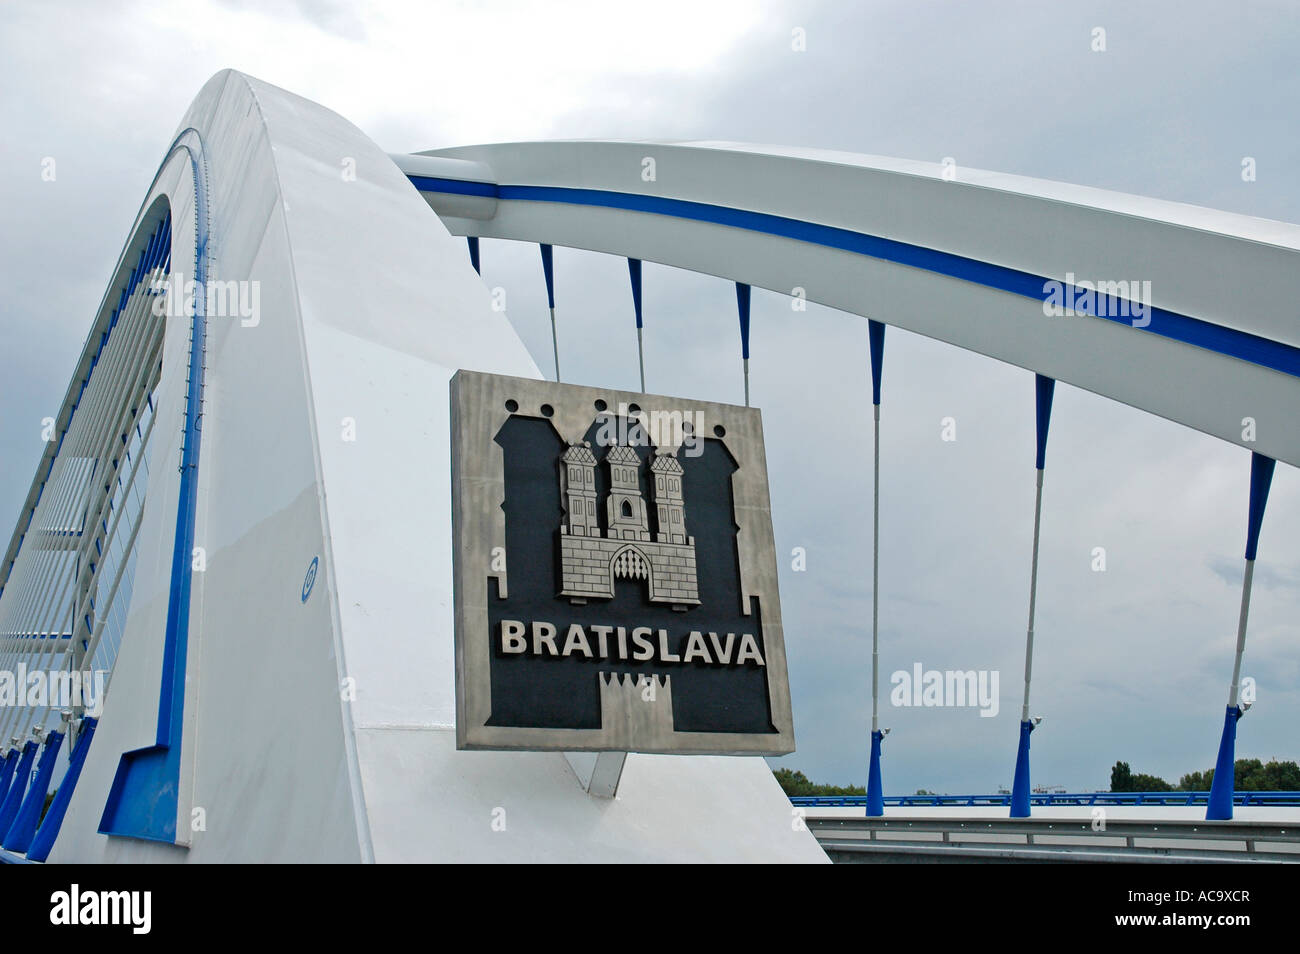 City coat of arms, Apollo bridge, Bratislava, Slovakia - Stock Image